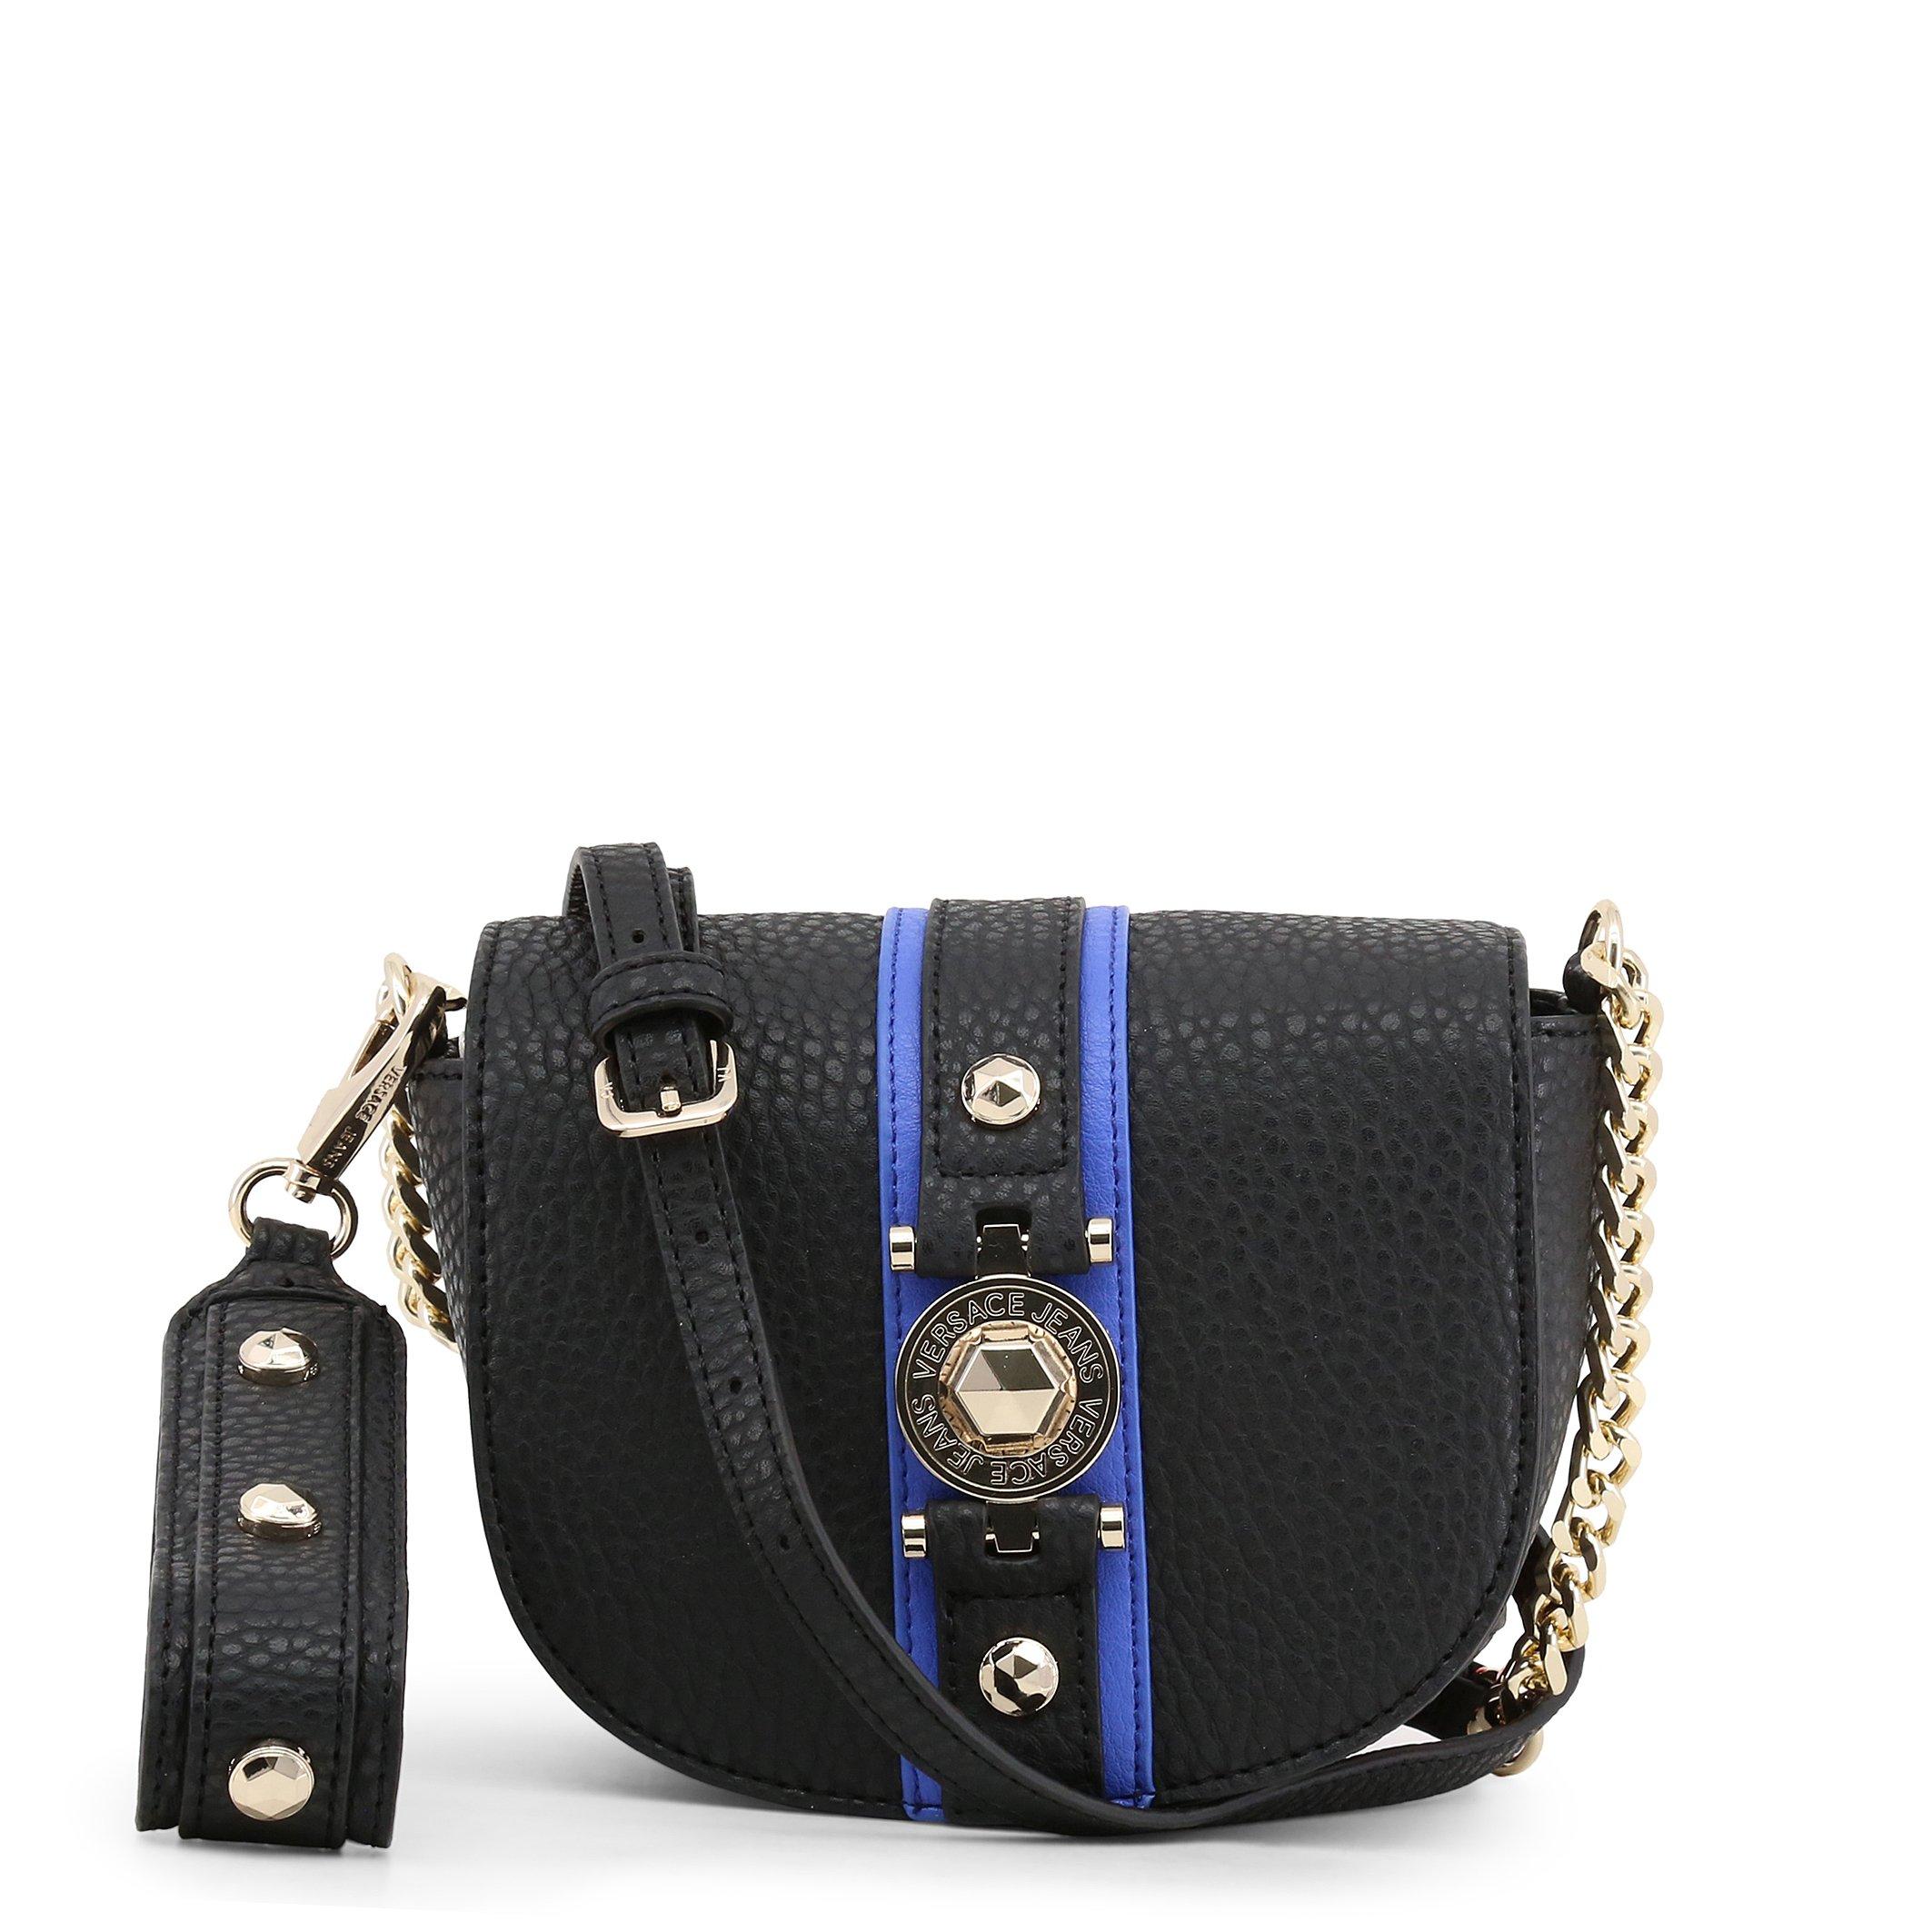 fe789d324e Versace Jeans E1VSBBF5_70711 #Versace #garden #coats #beauty #men #babies  #hair #dogs #furniture #shoes